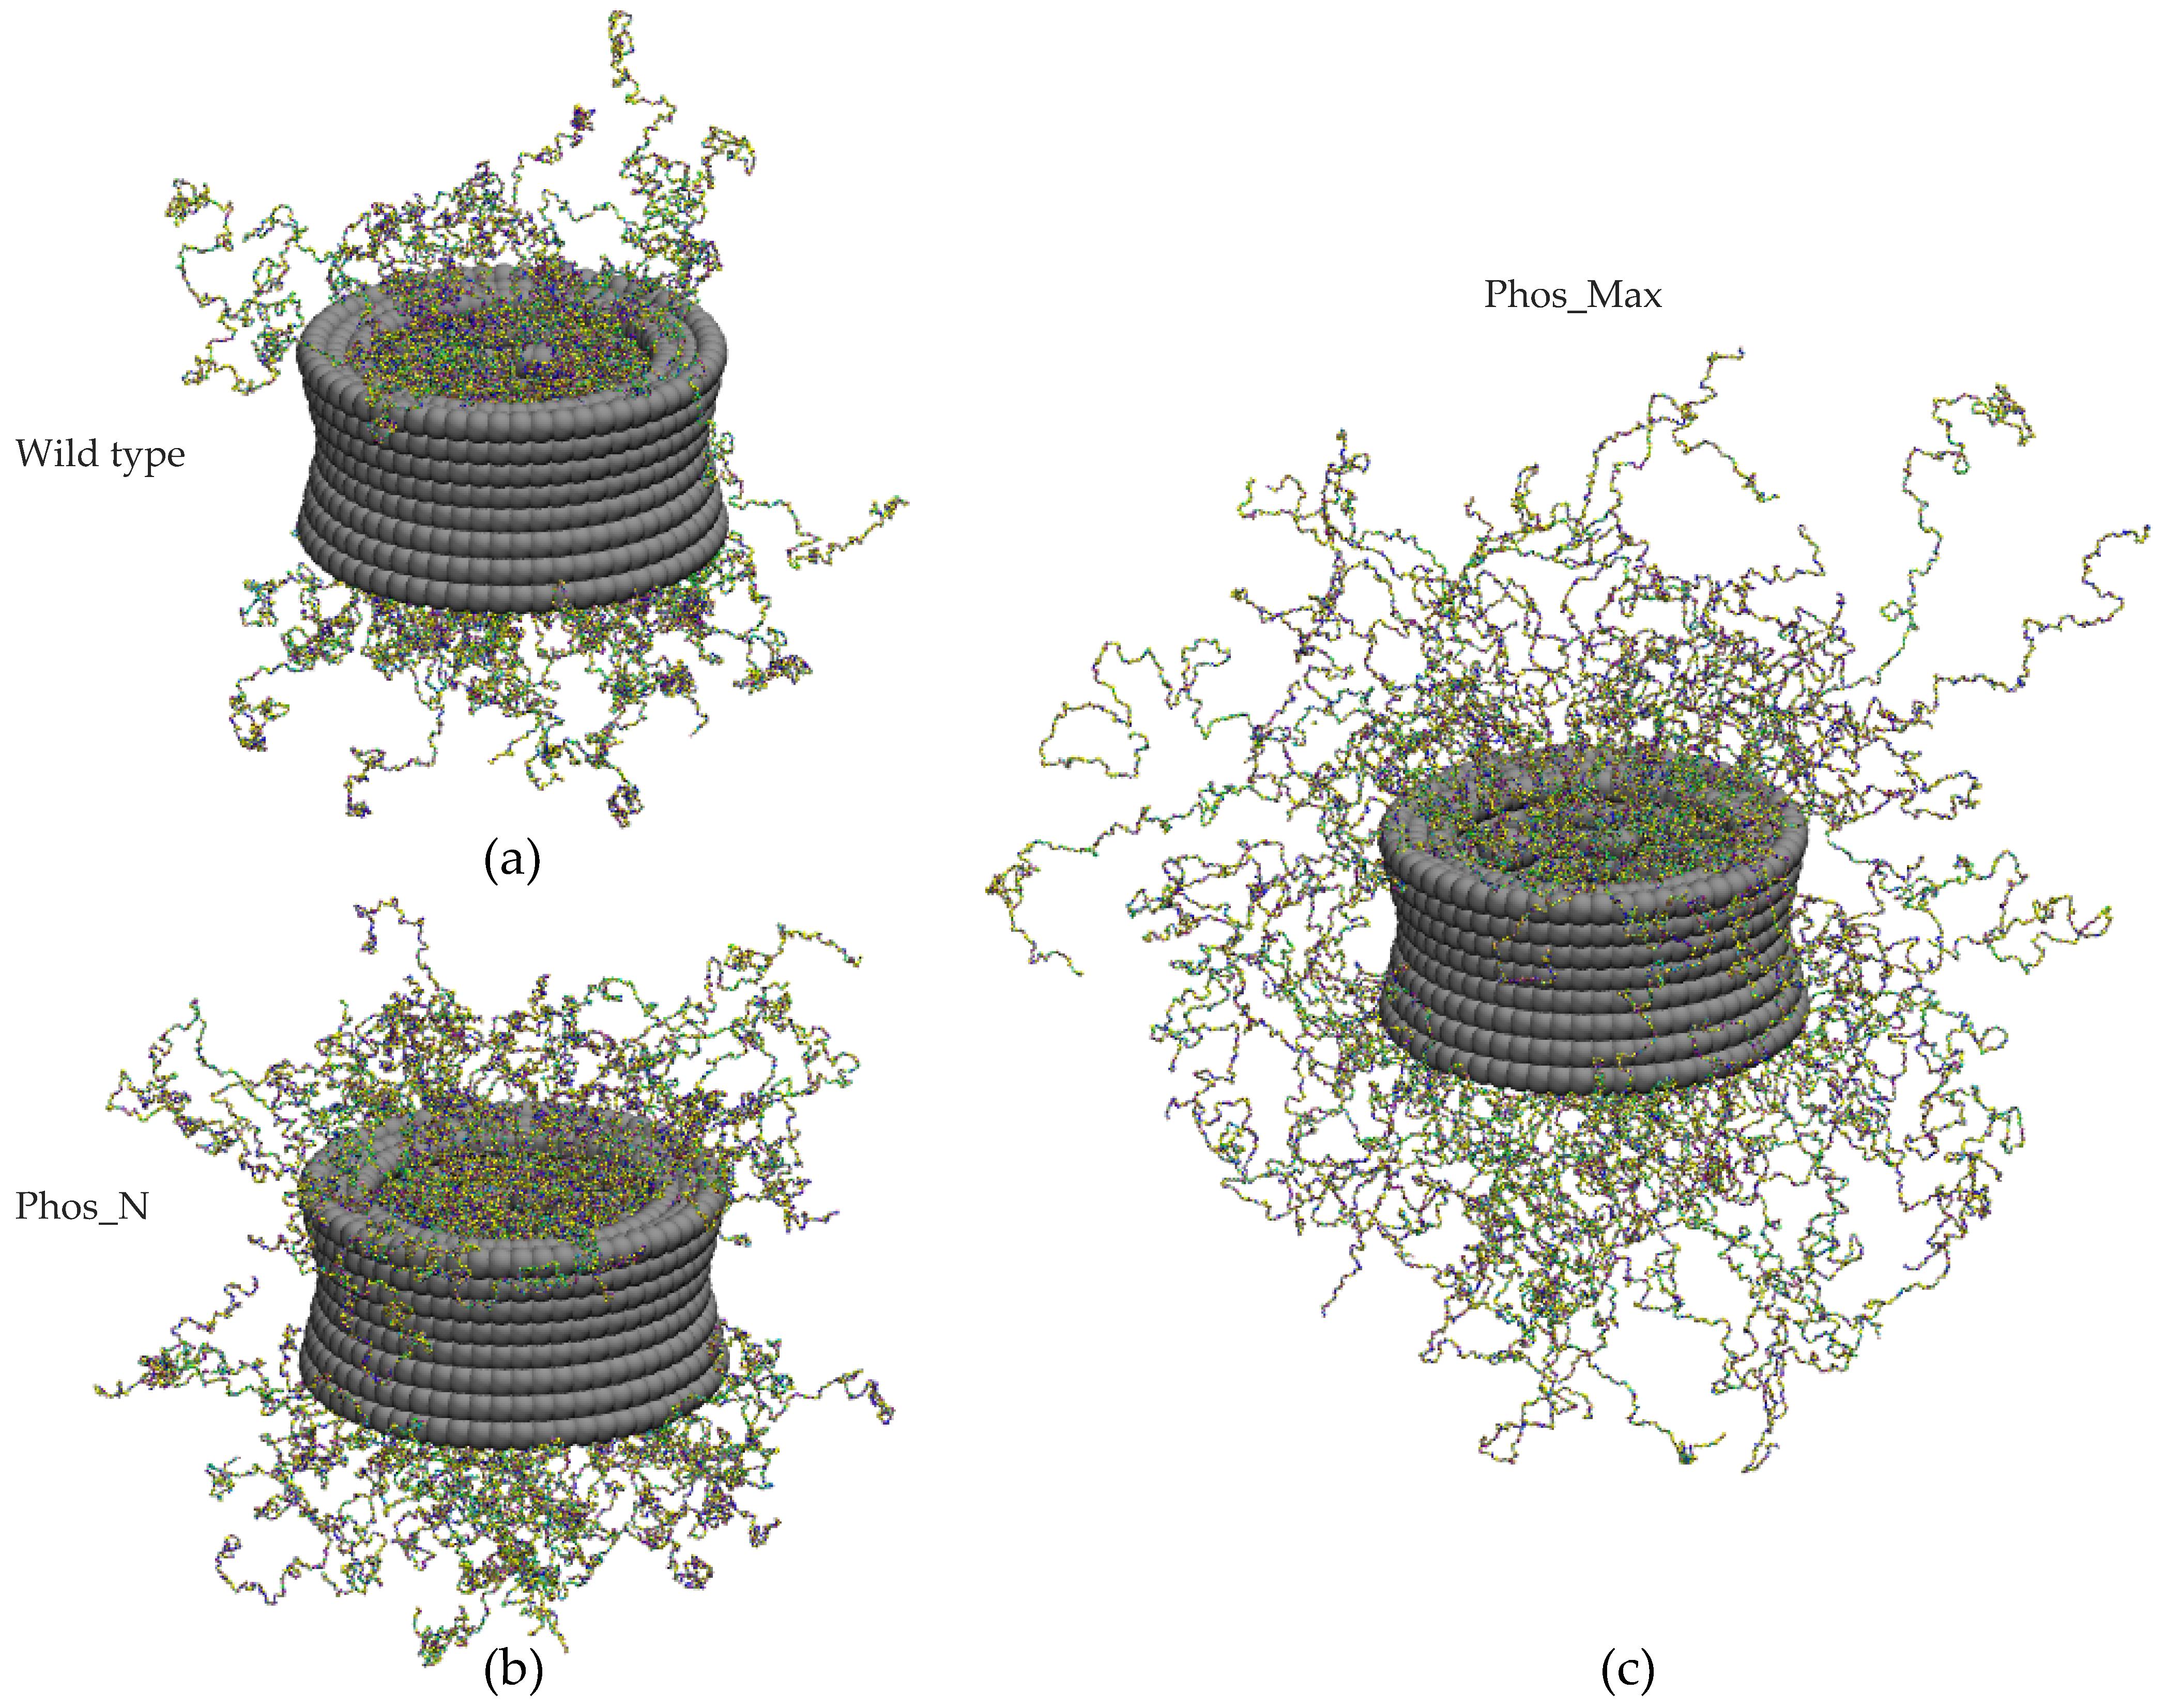 Ijms Free Full Text The Effect Of Fg Nup Phosphorylation On Npc Selectivity A One Bead Per Amino Acid Molecular Dynamics Study